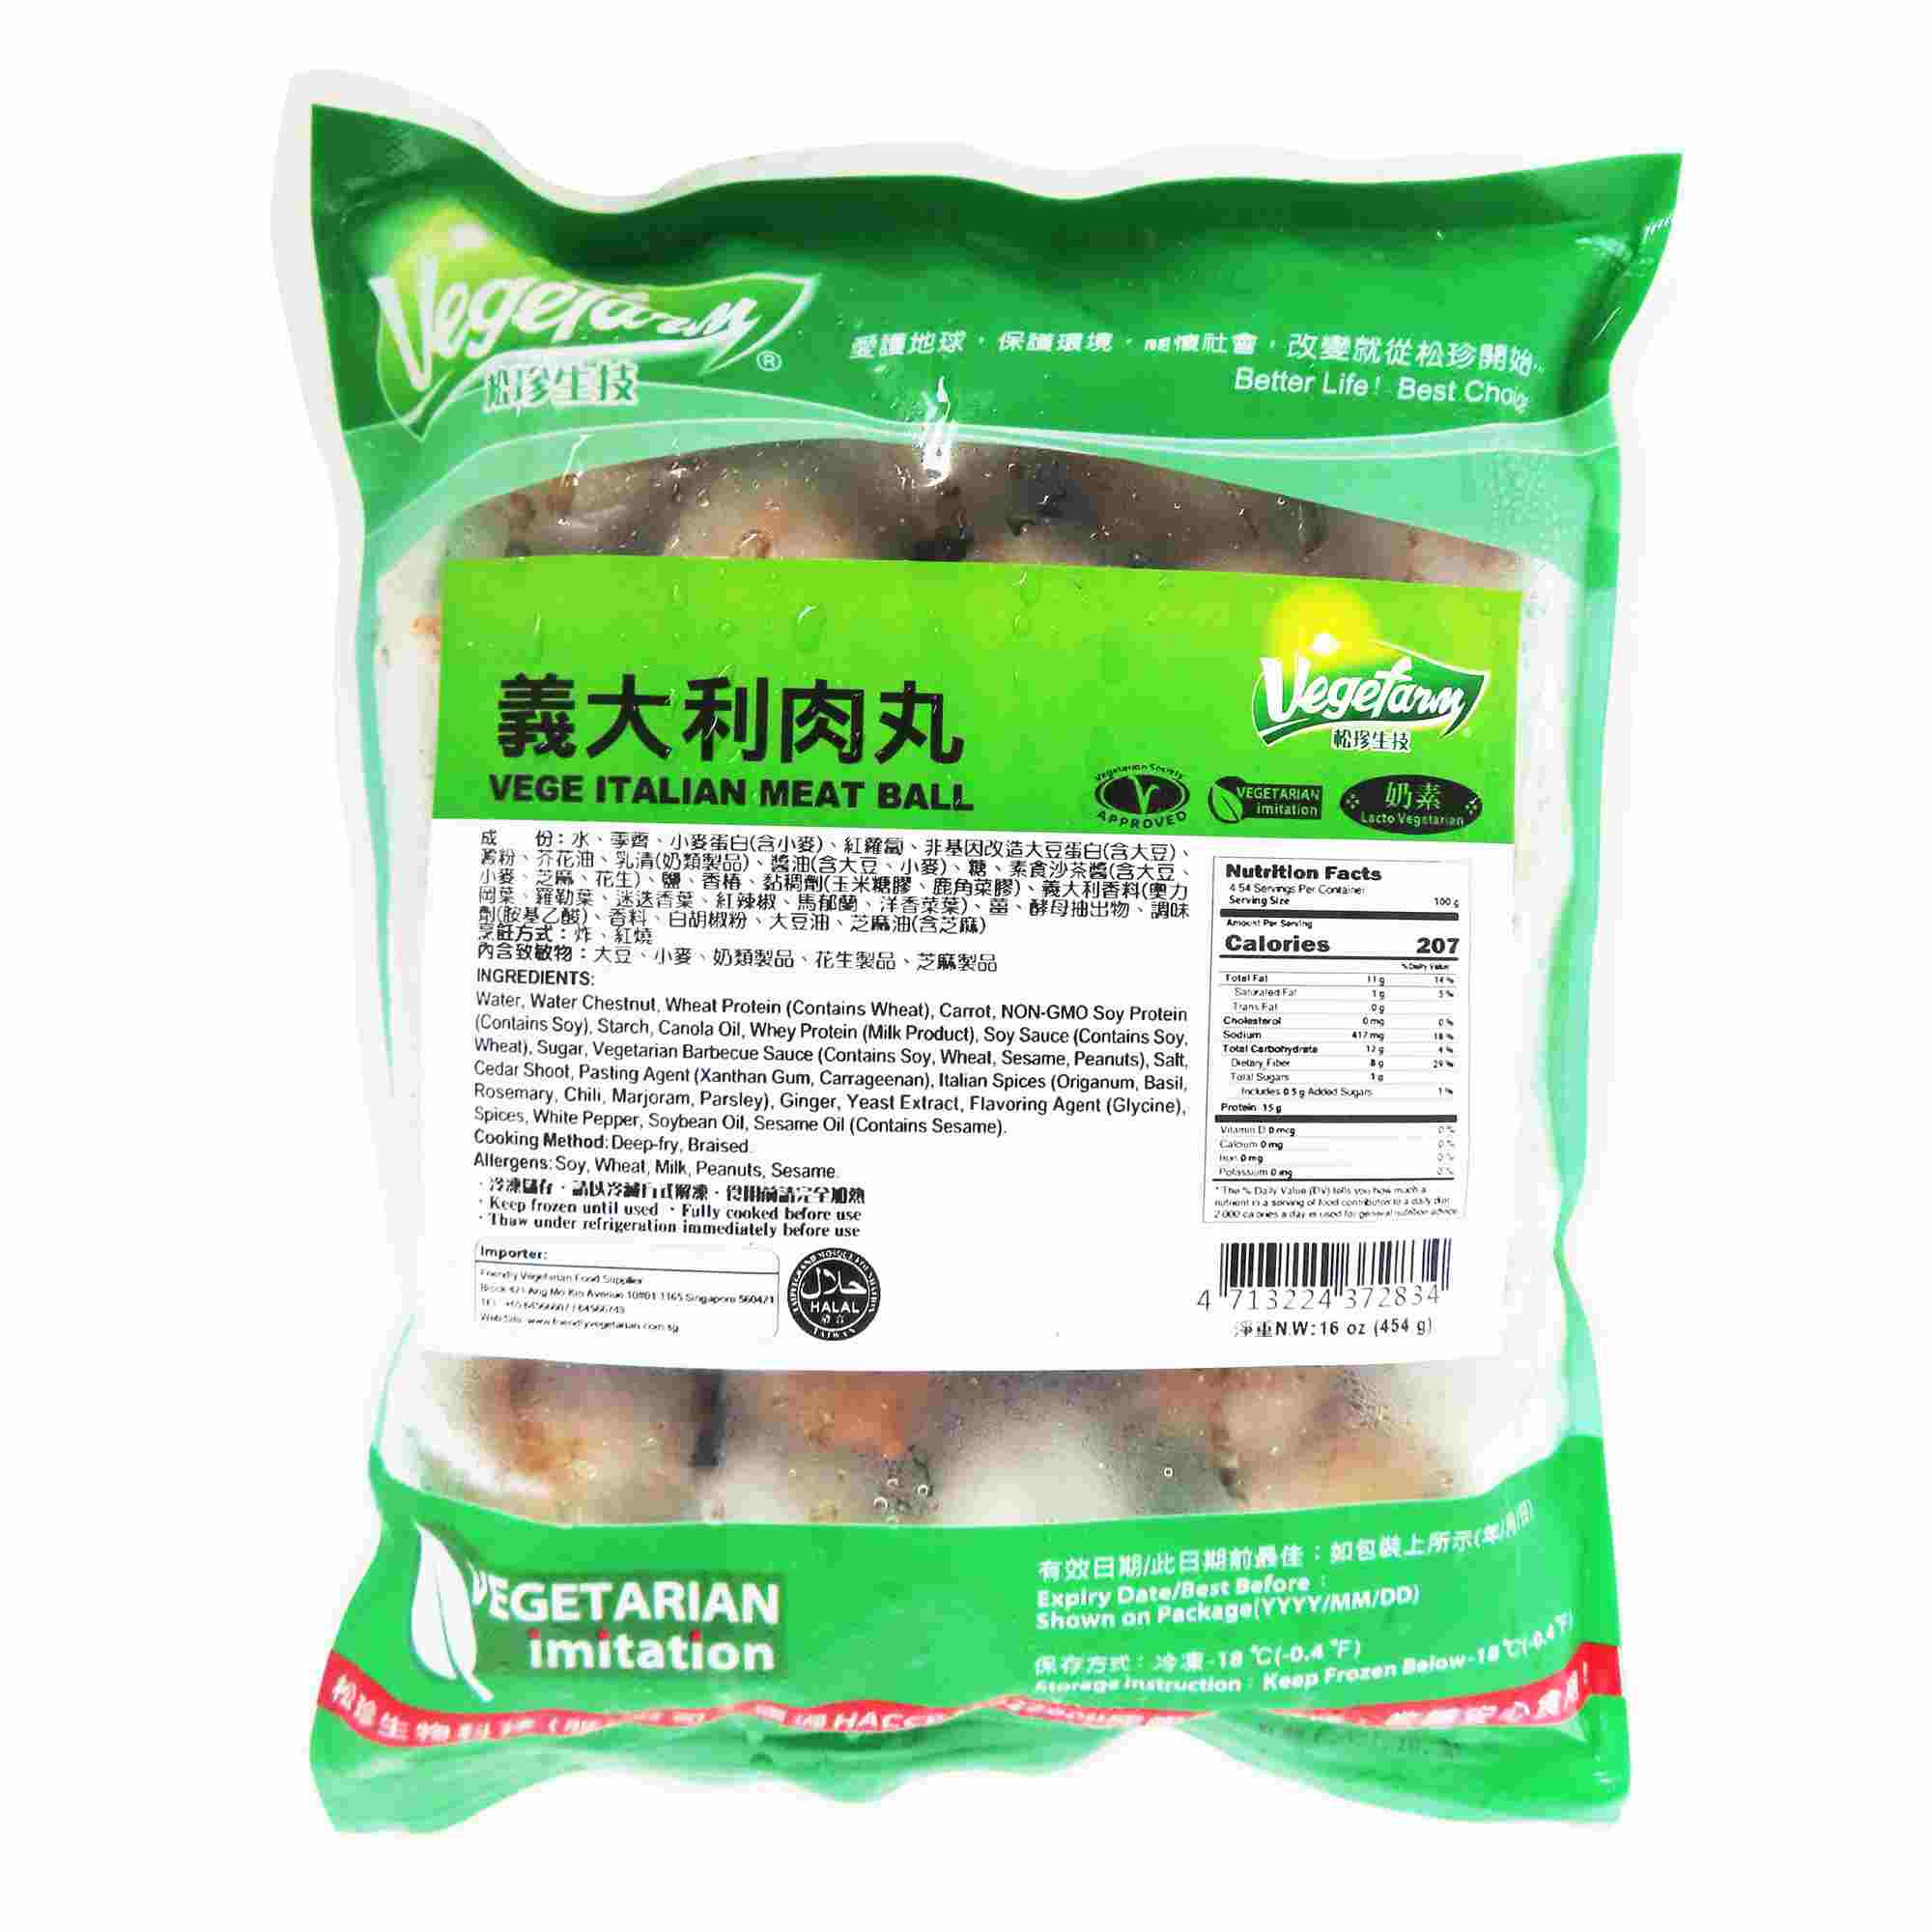 Image Vegefarm Vege Italian Meatball 松珍 - 意大利肉丸 454grams